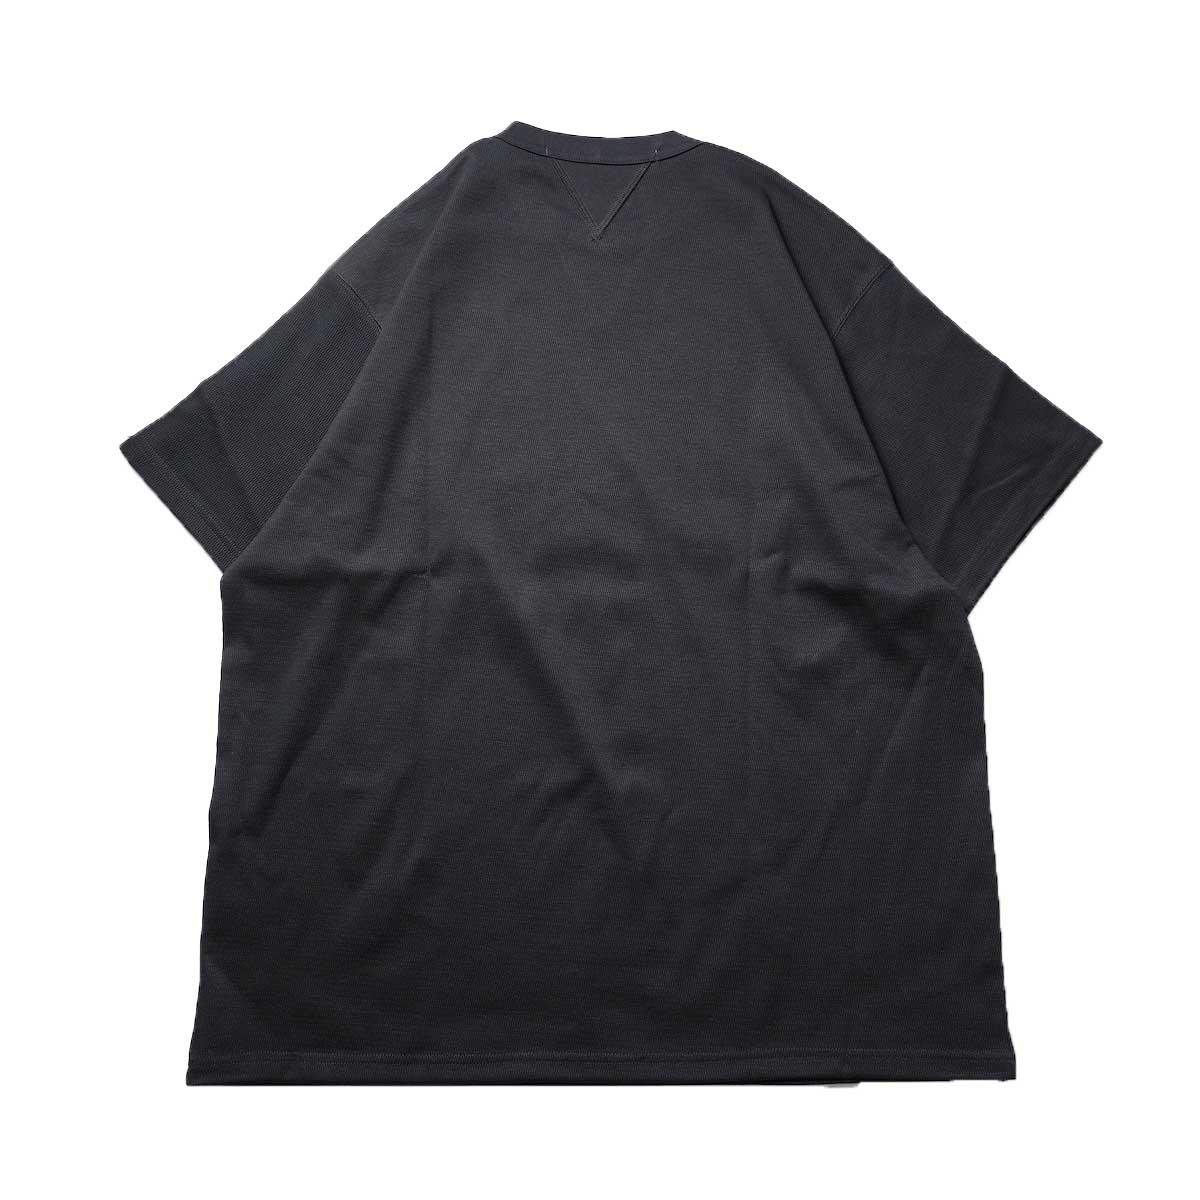 FUTURE PRIMITIVE / FP THERMAL V T-SHIRT (Black)背面